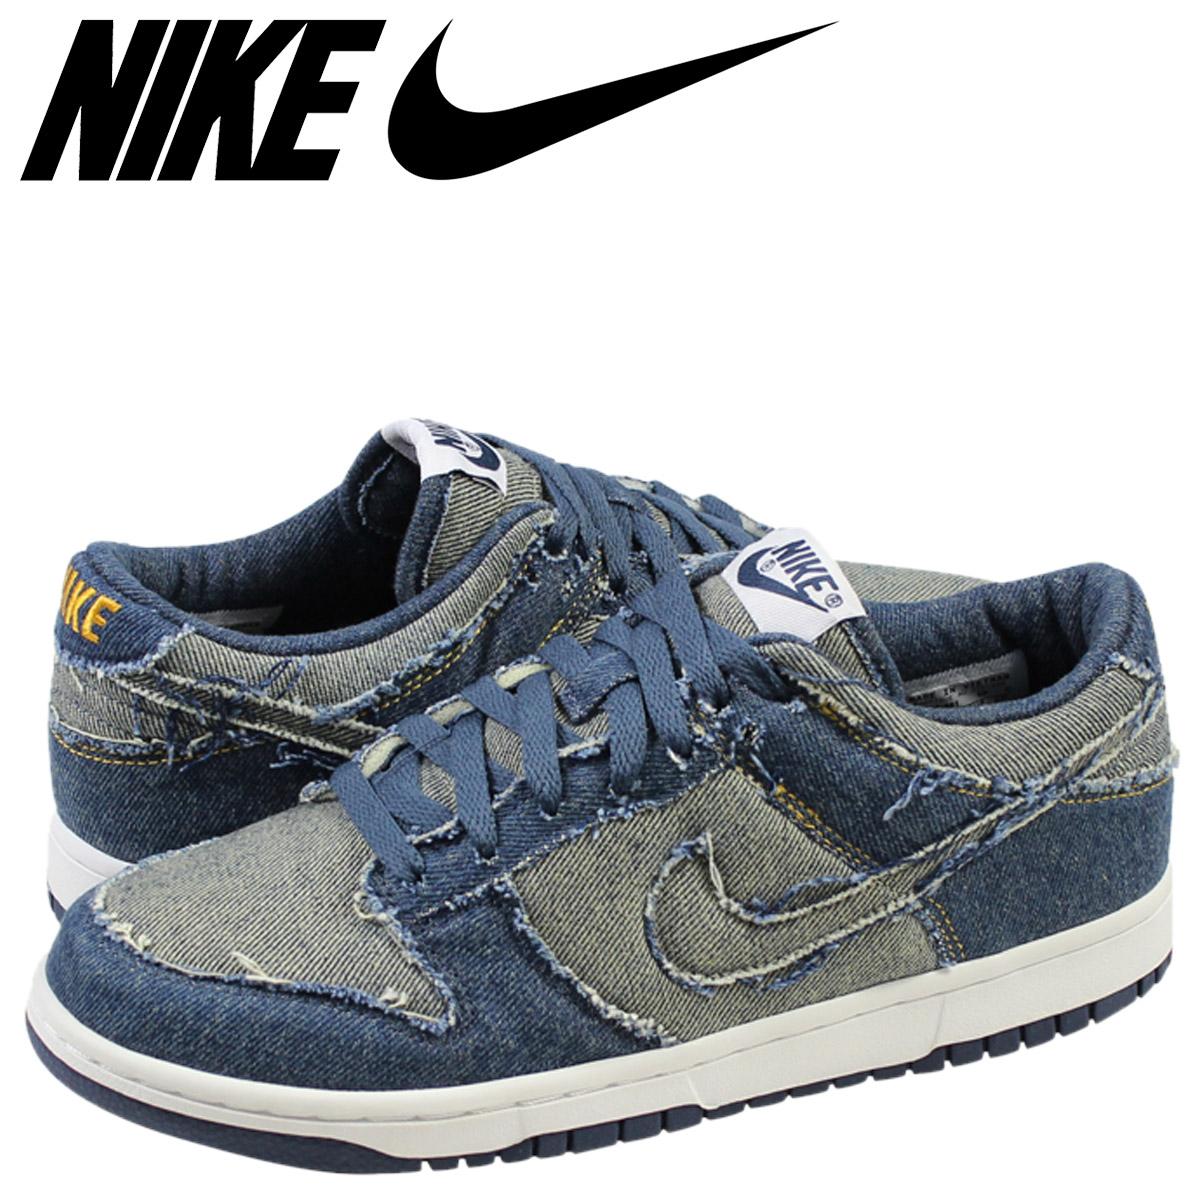 online retailer b74c6 4e6da NIKE Nike dunk sneakers DUNK LOW CL LIMITED DENIM dunk low limited denim  304,714-441 indigo men